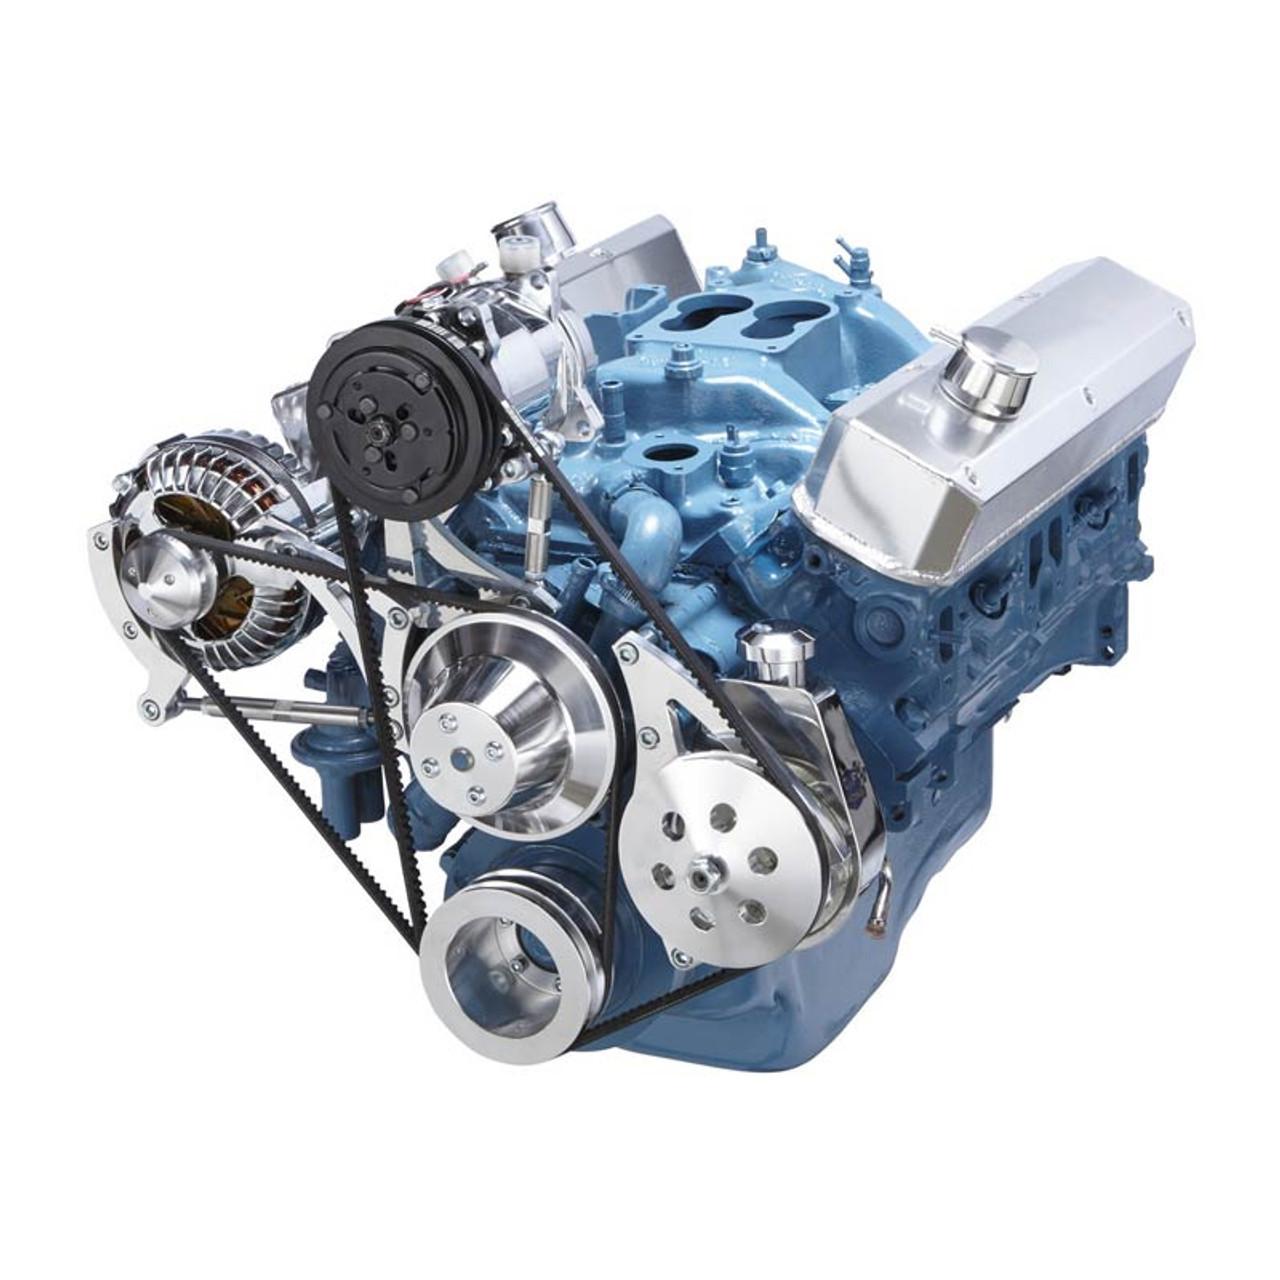 chrysler small block power steering, a c & alternator system (318, 340 & 360)  318 engine fan belt diagram #8